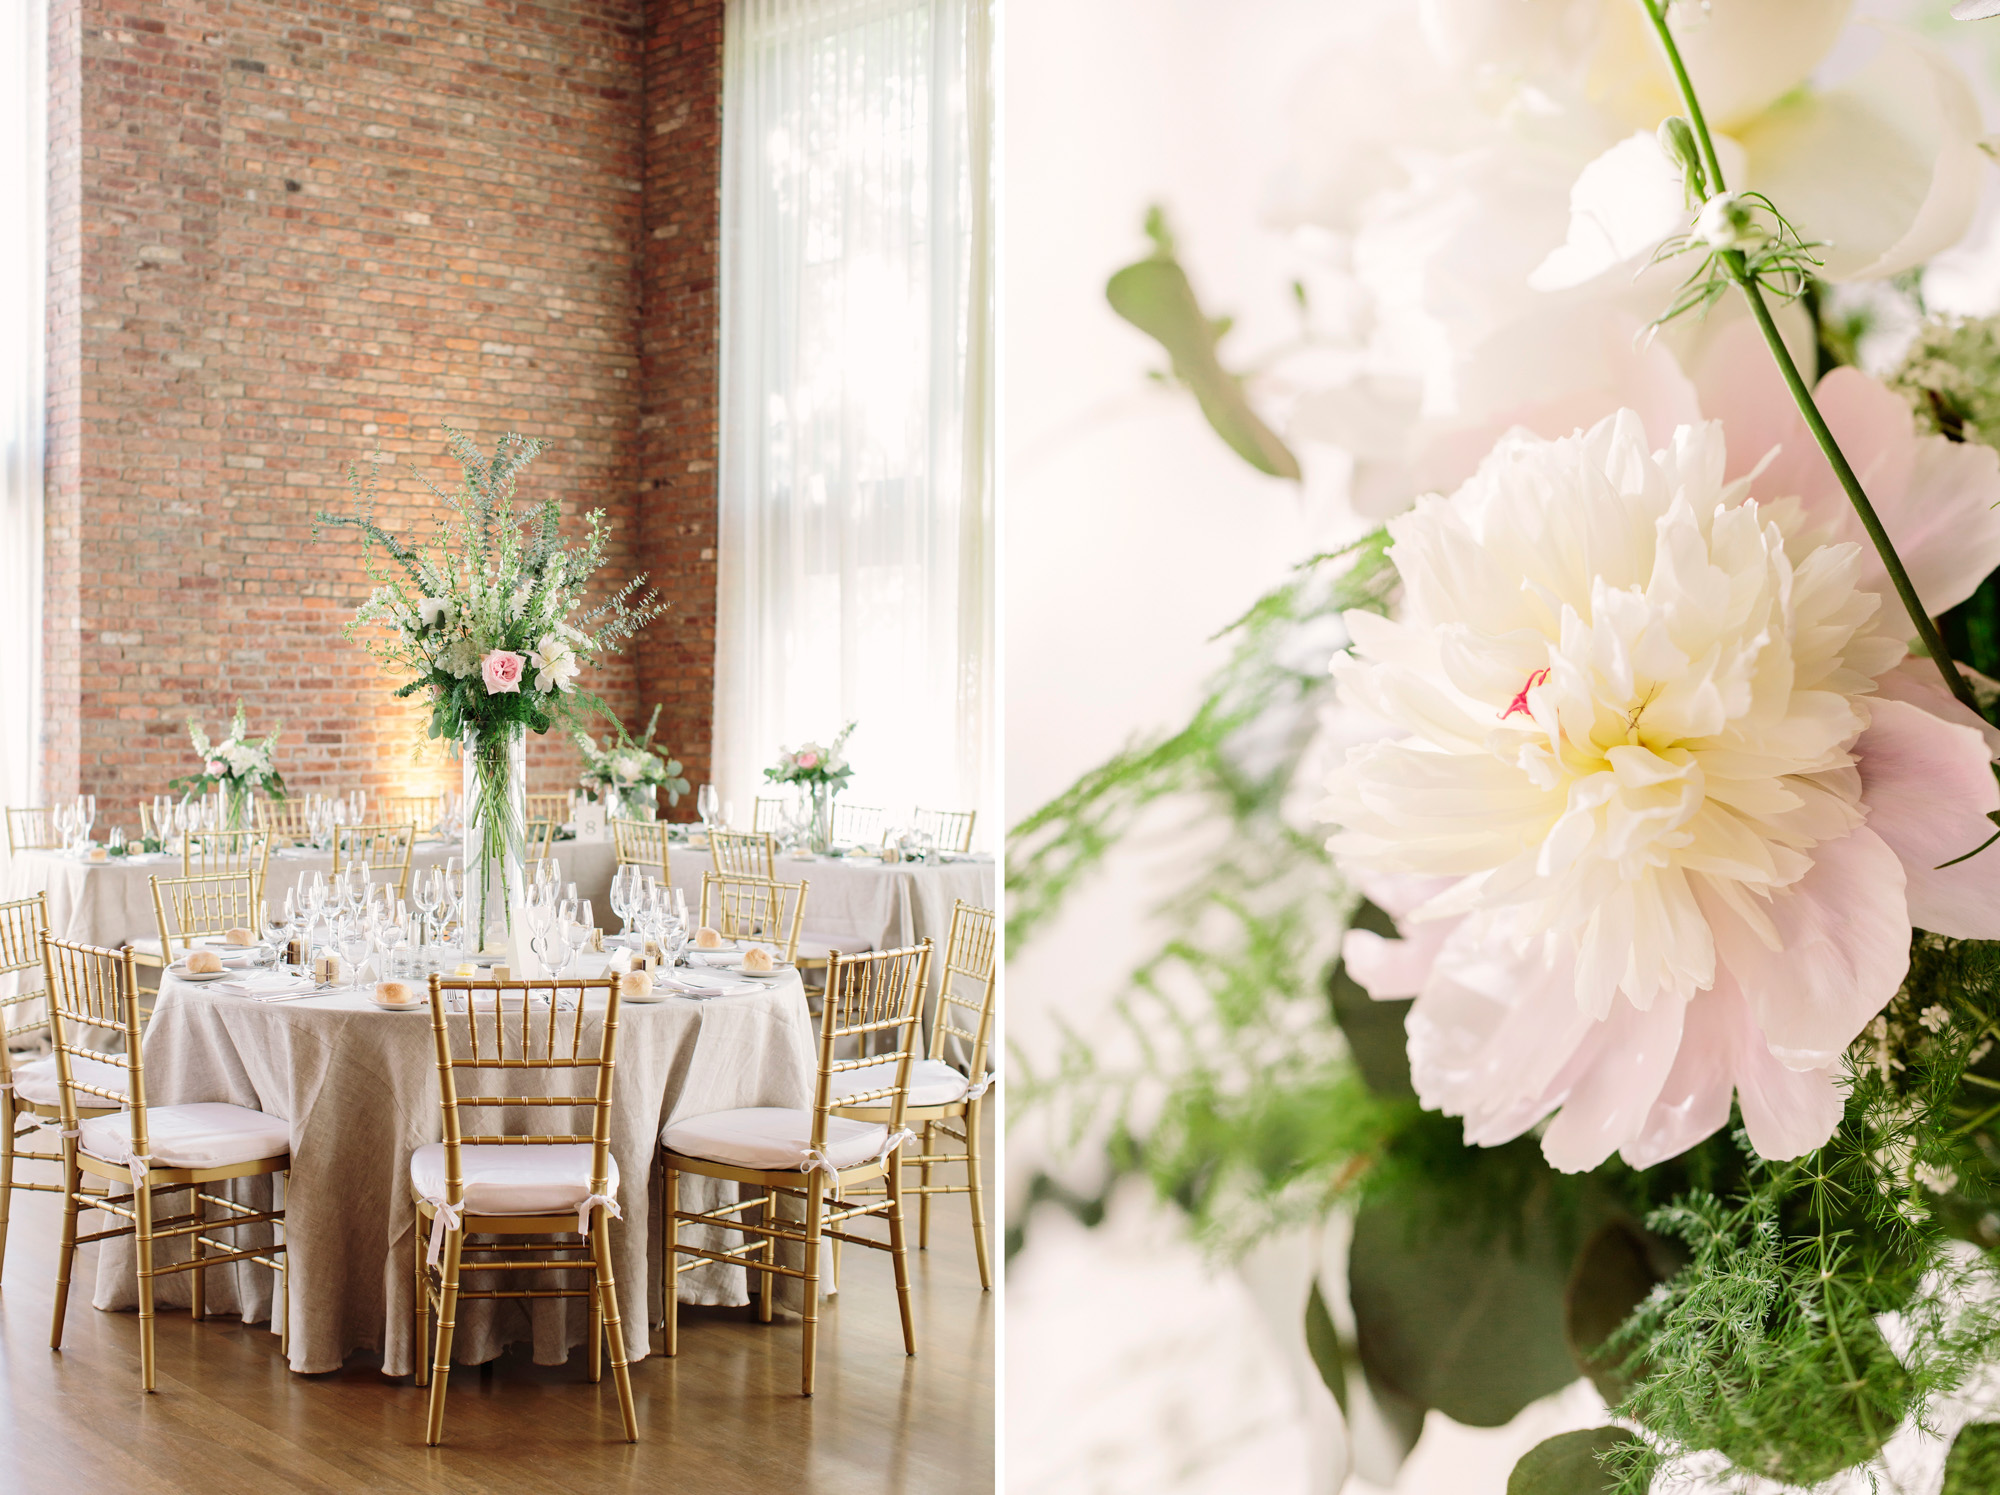 61_Rowan_Brian_The_Roundhouse_Wedding_Beacon_NY_Tanya_Salazar_Photography.jpg